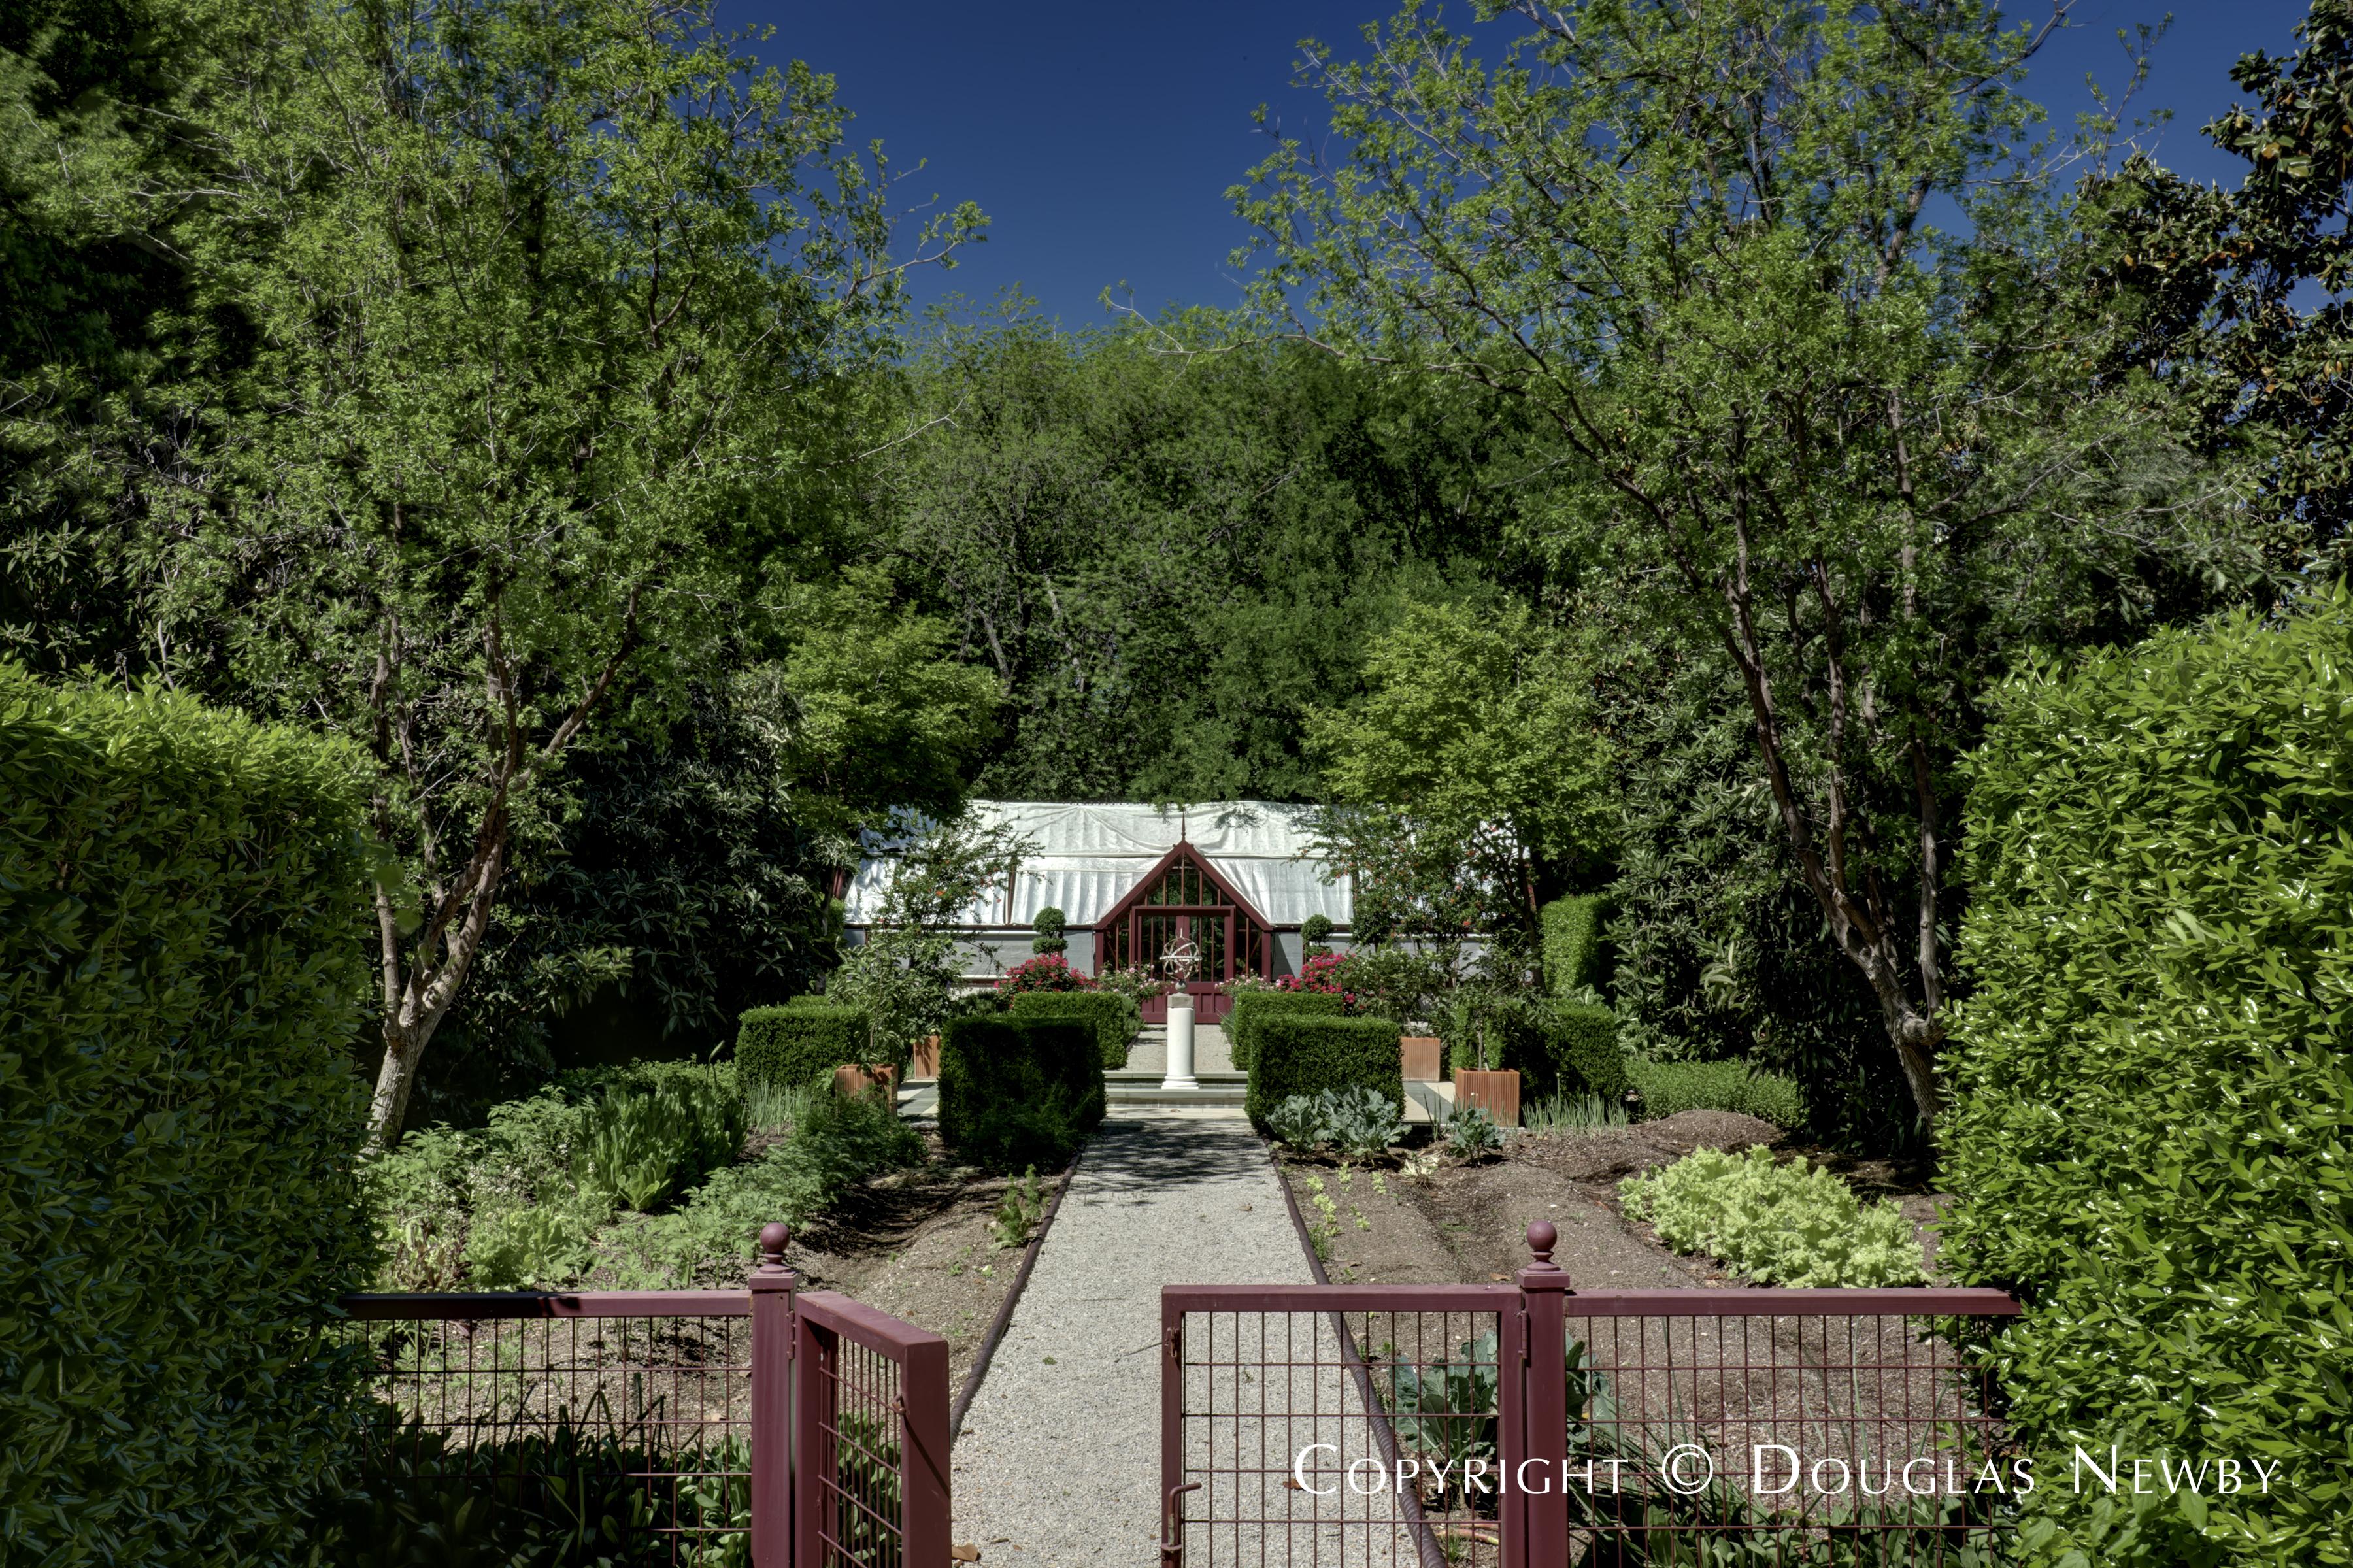 Green House on Dallas Estate Property